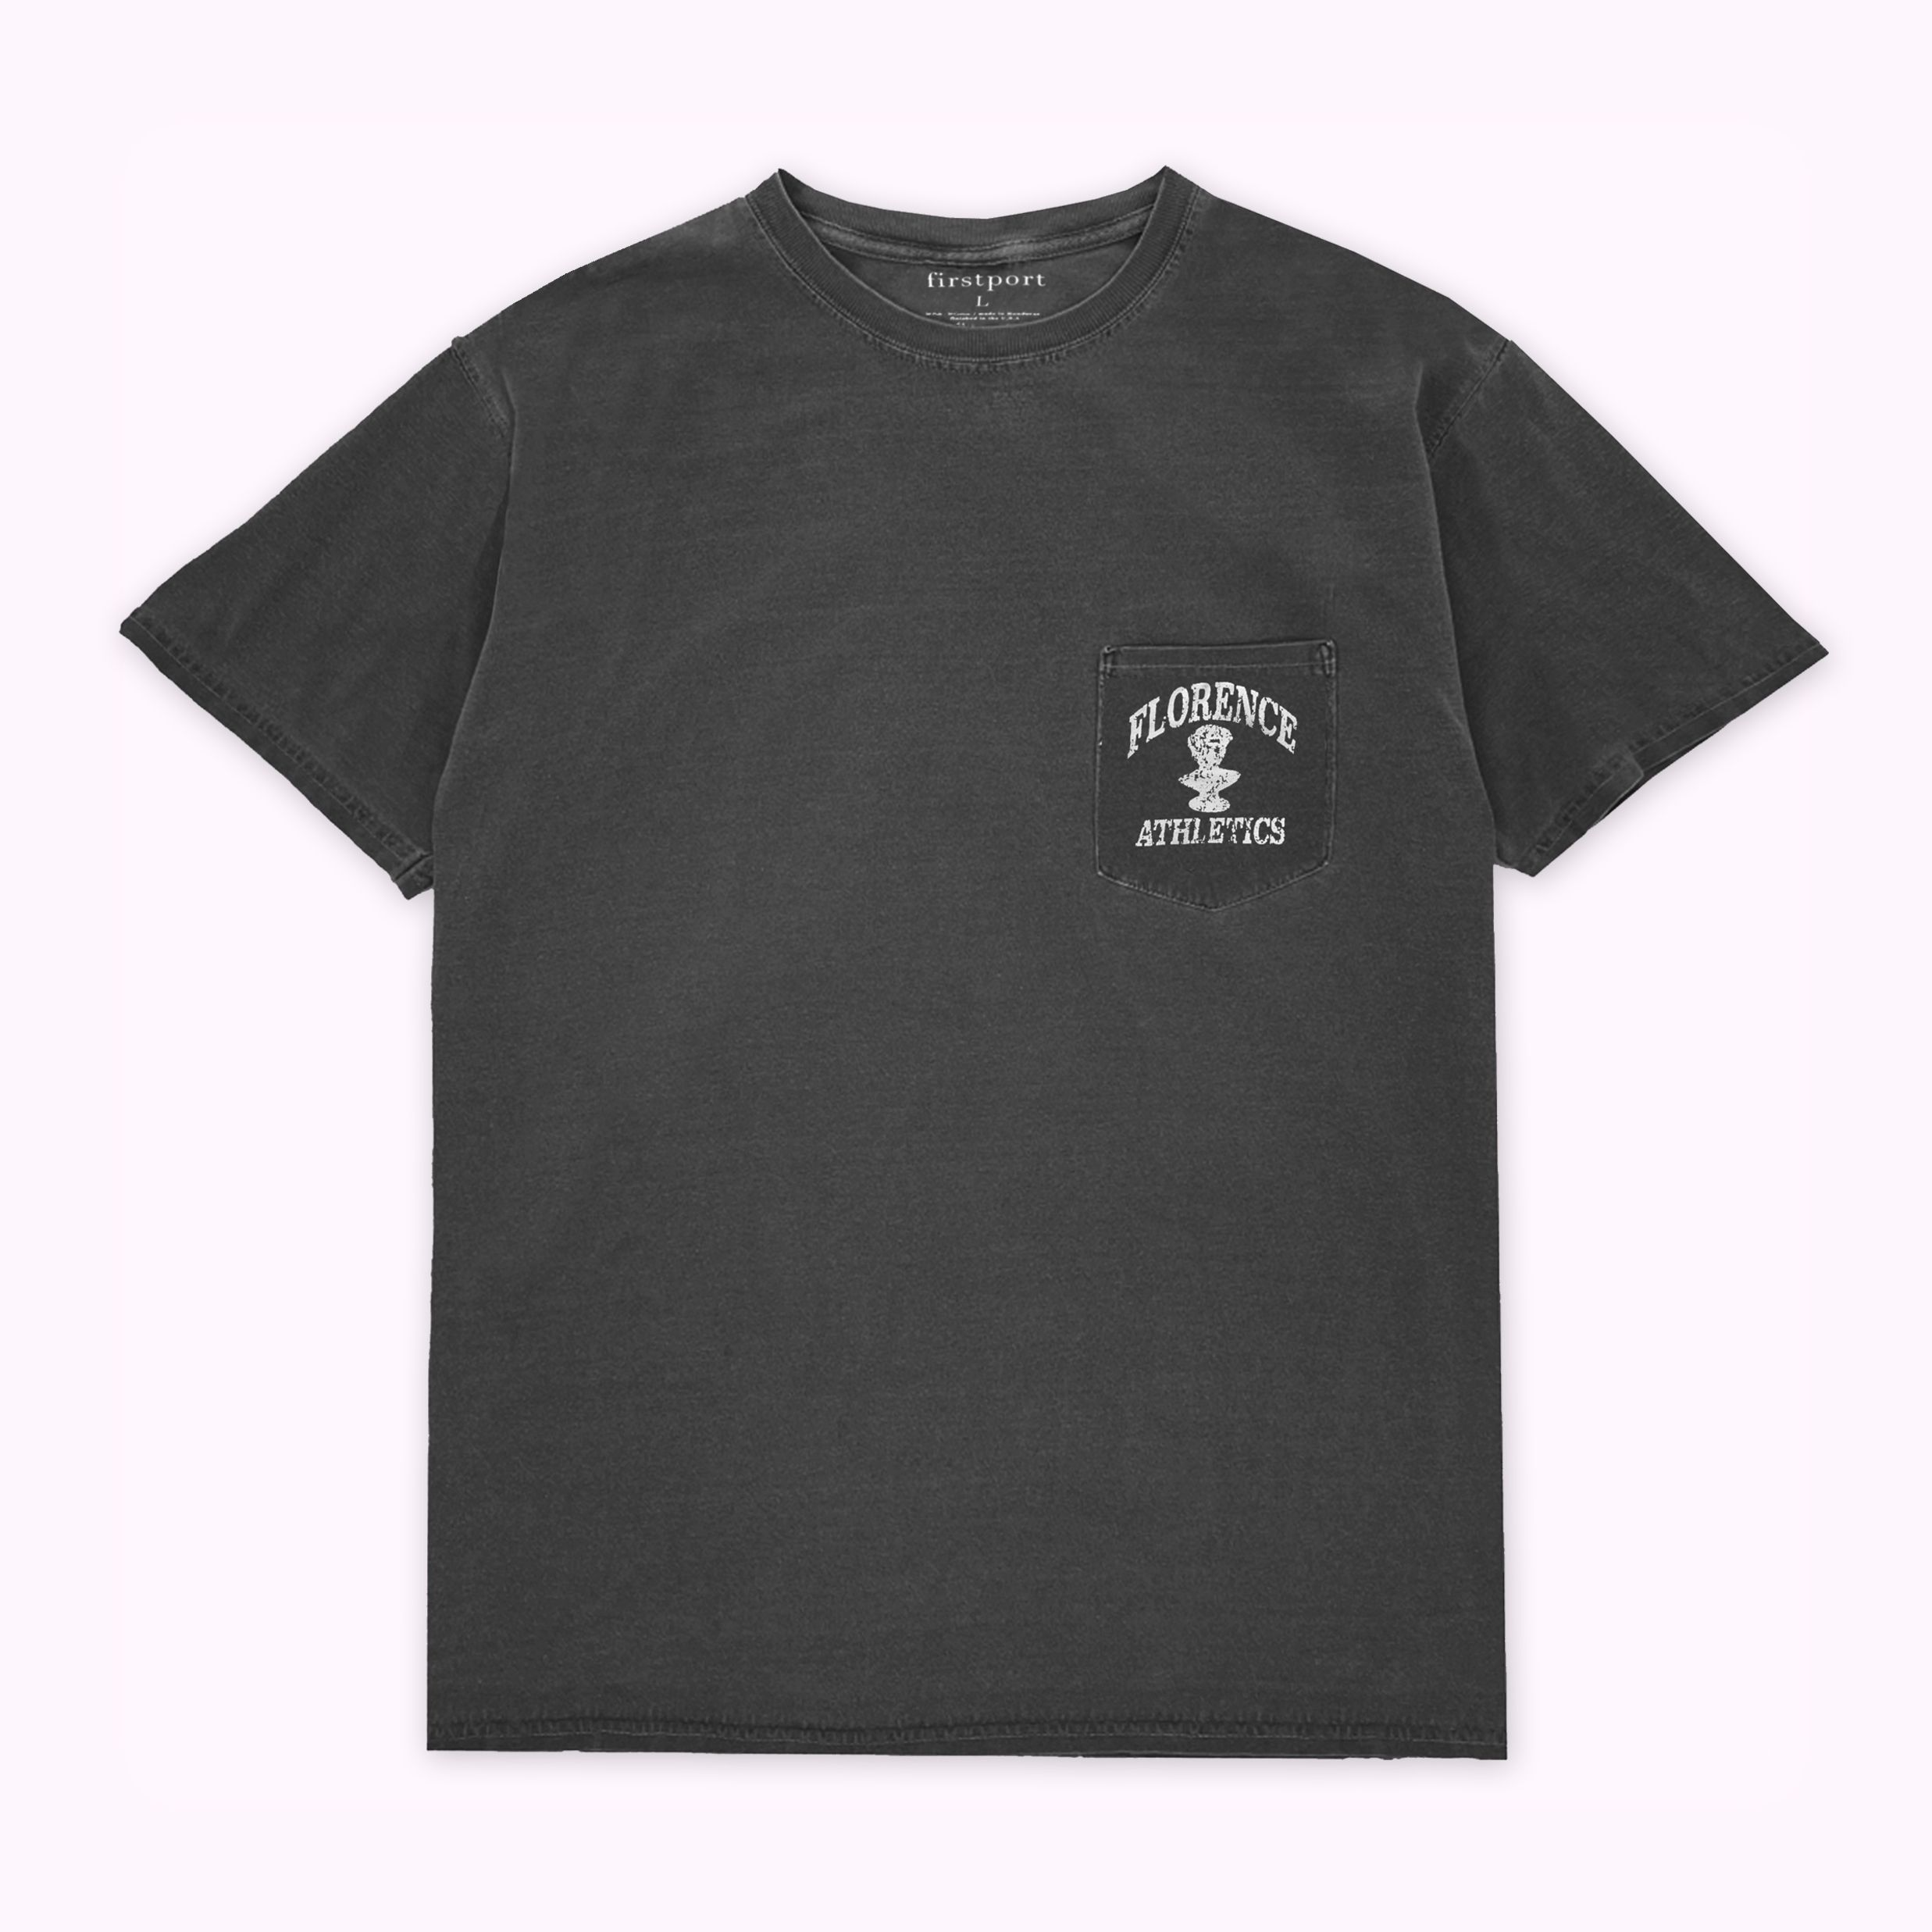 Florence Athletics Crackle Pocket T-shirt - Dyed Black ...